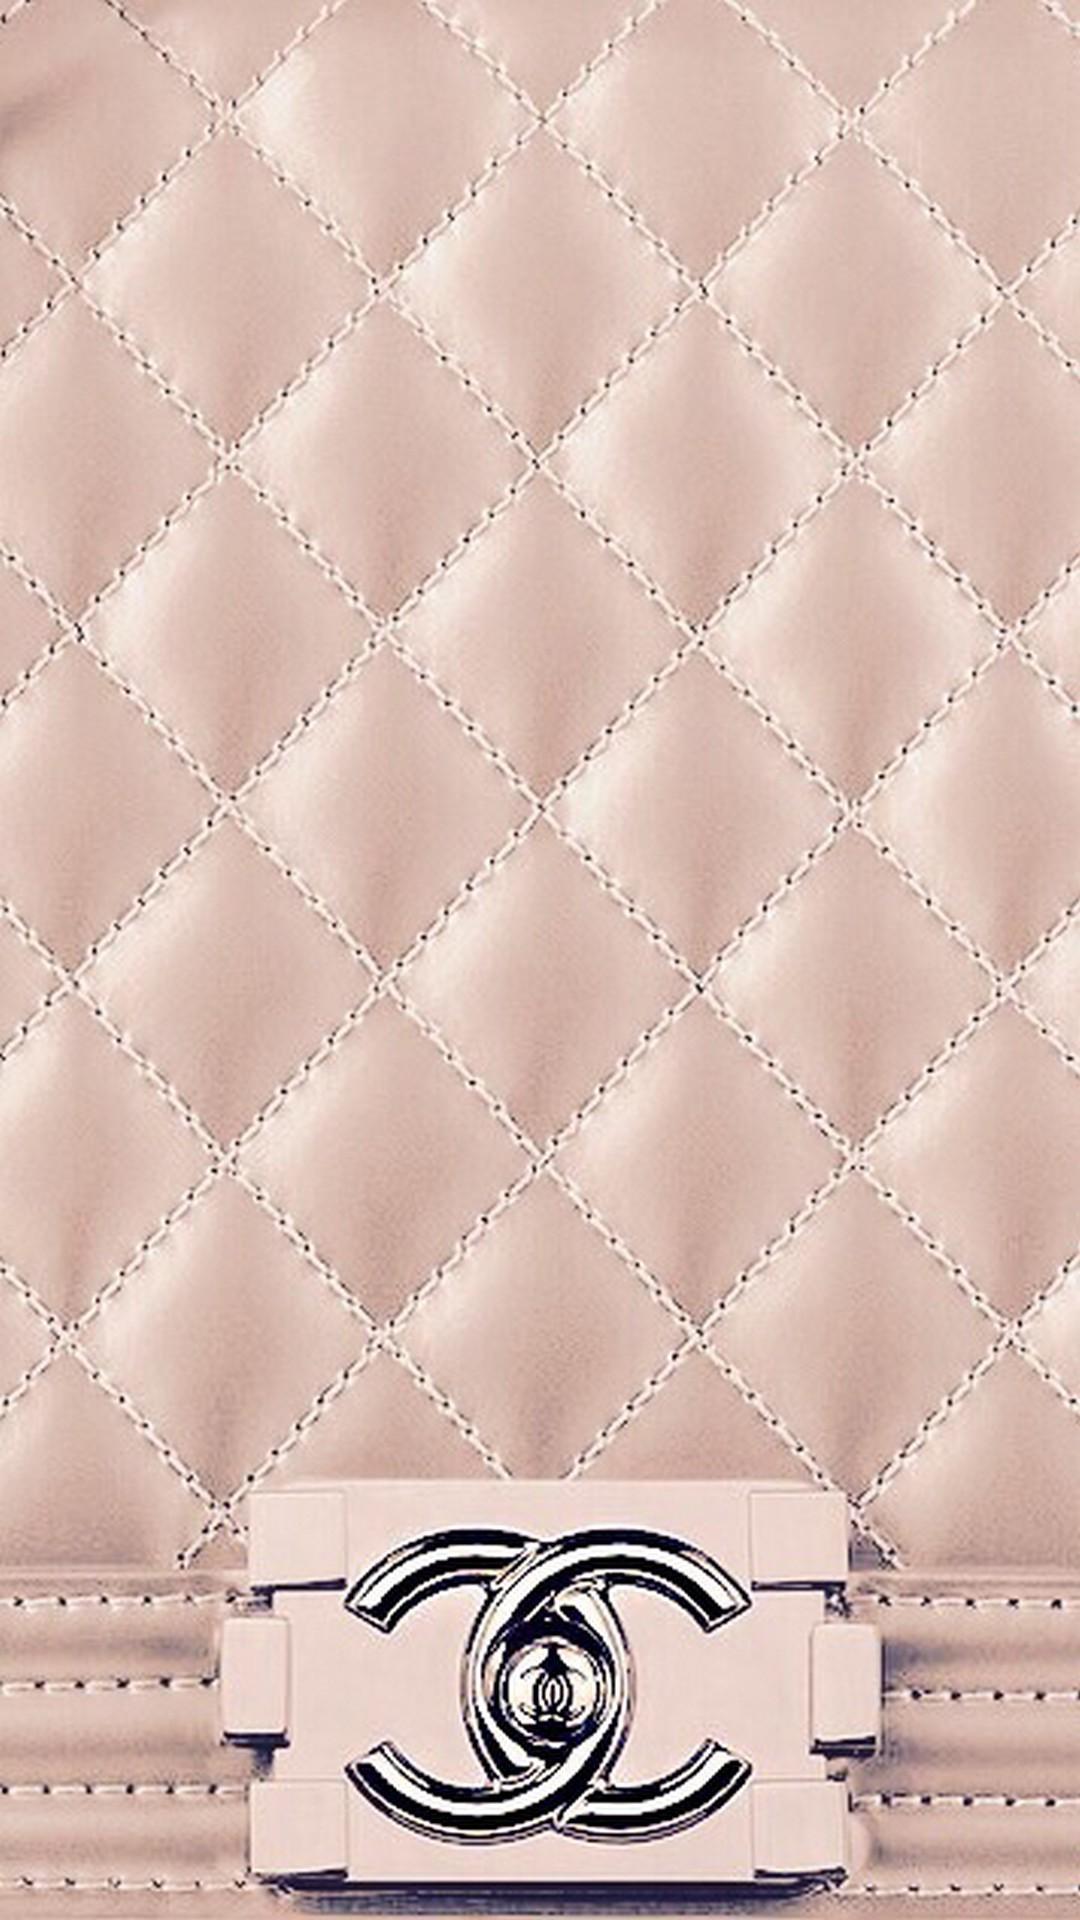 Res: 1080x1920, iPhone X Wallpaper Rose Gold Themen mit  Auflösung wallpaper  themen iphone auflosung